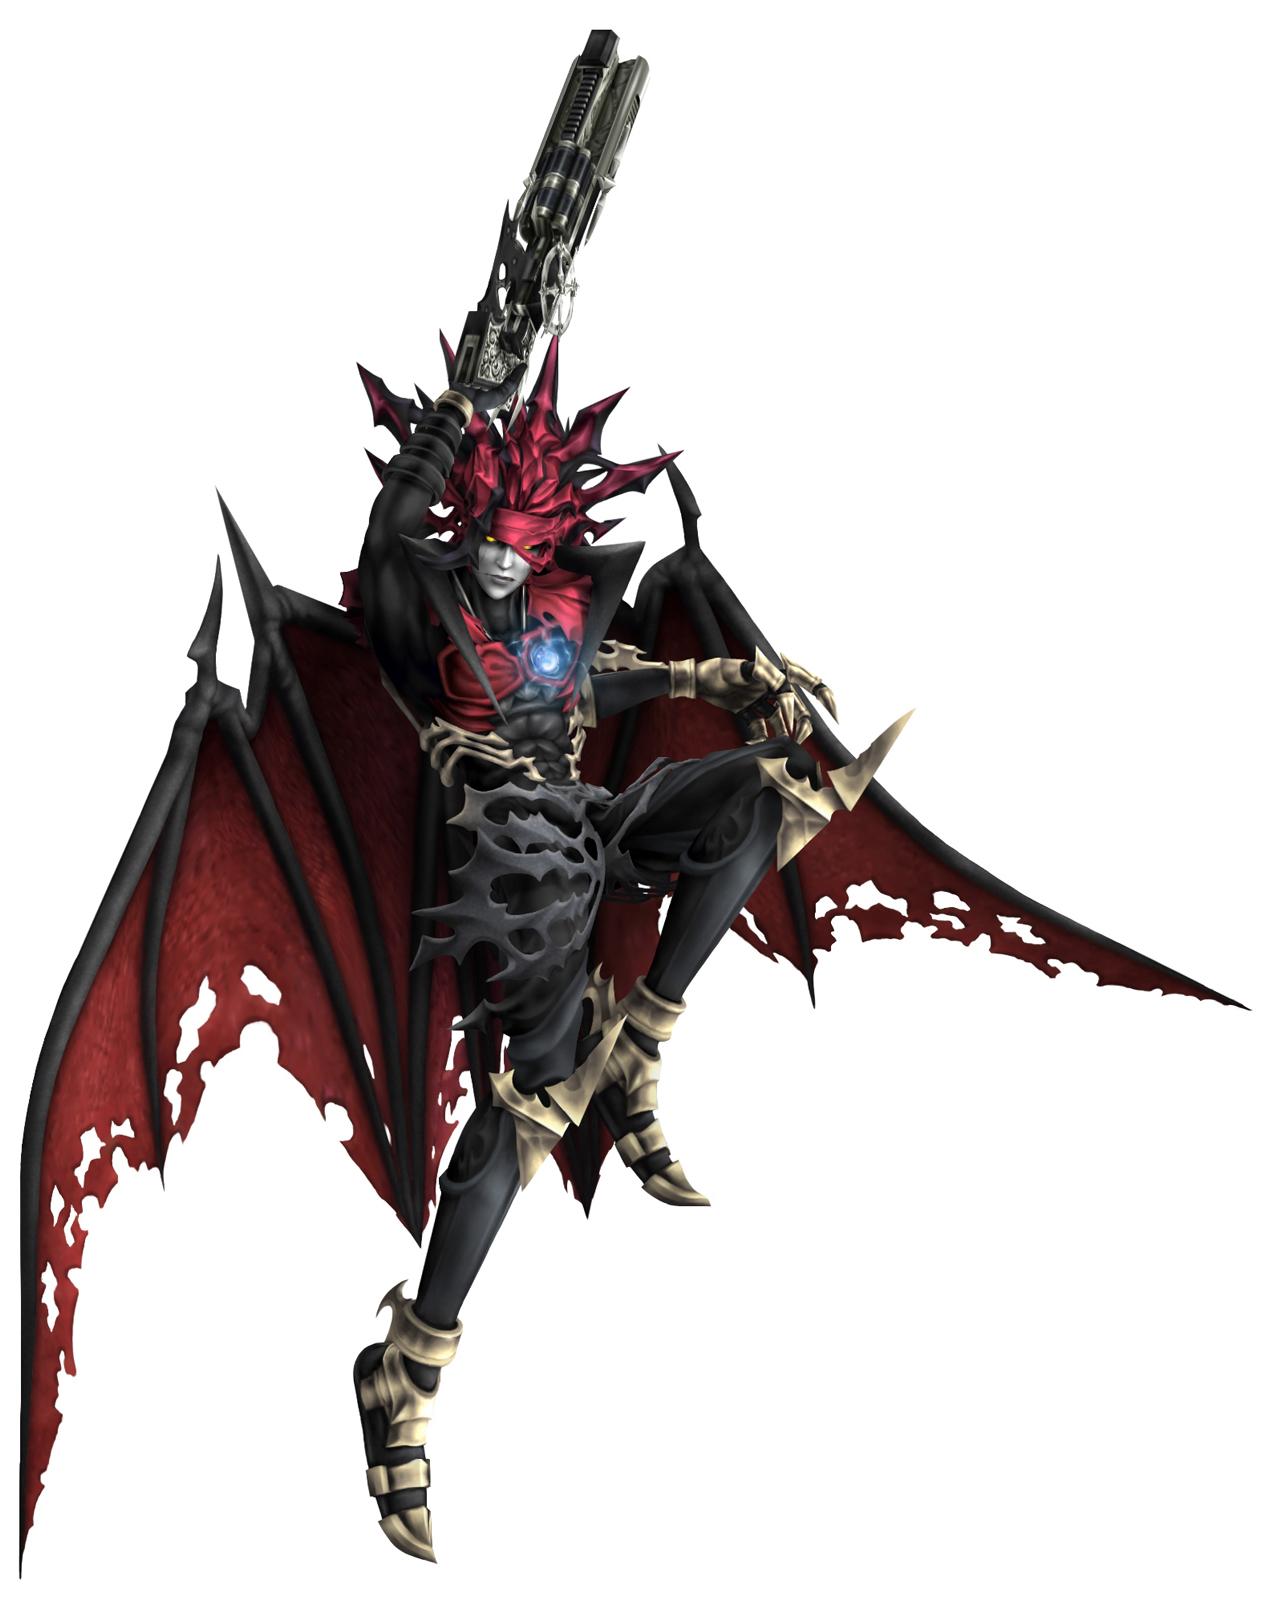 ... Fantasy VII Excavation - Dirge of Cerberus - Art - Main Characters